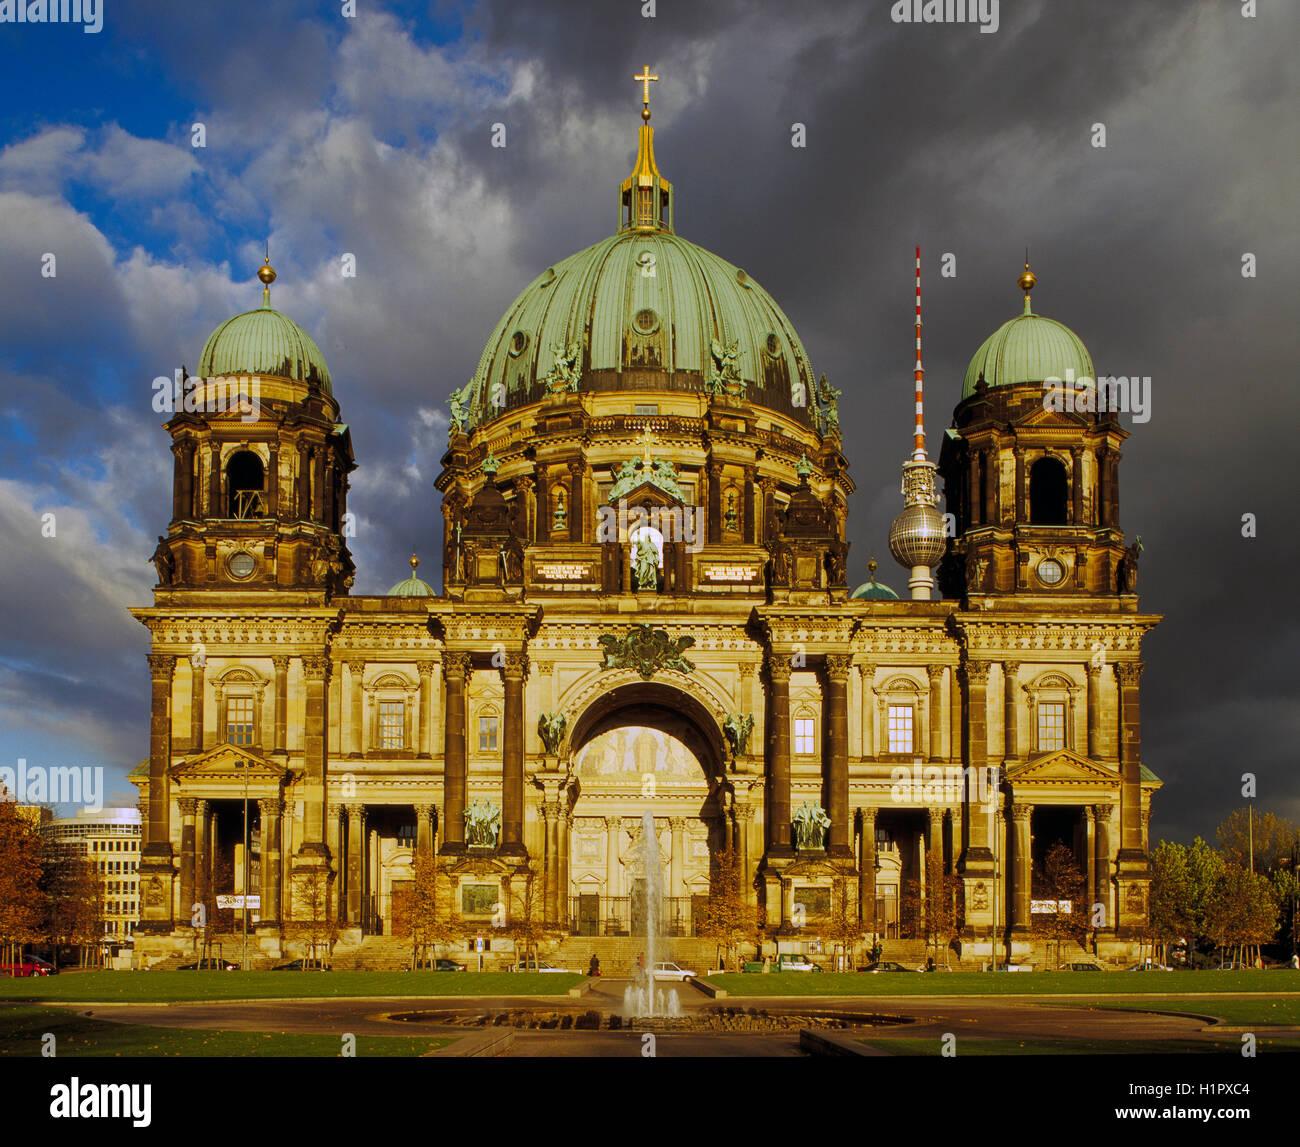 Der Berliner Dom, Berlin, Deutschland Stockfoto